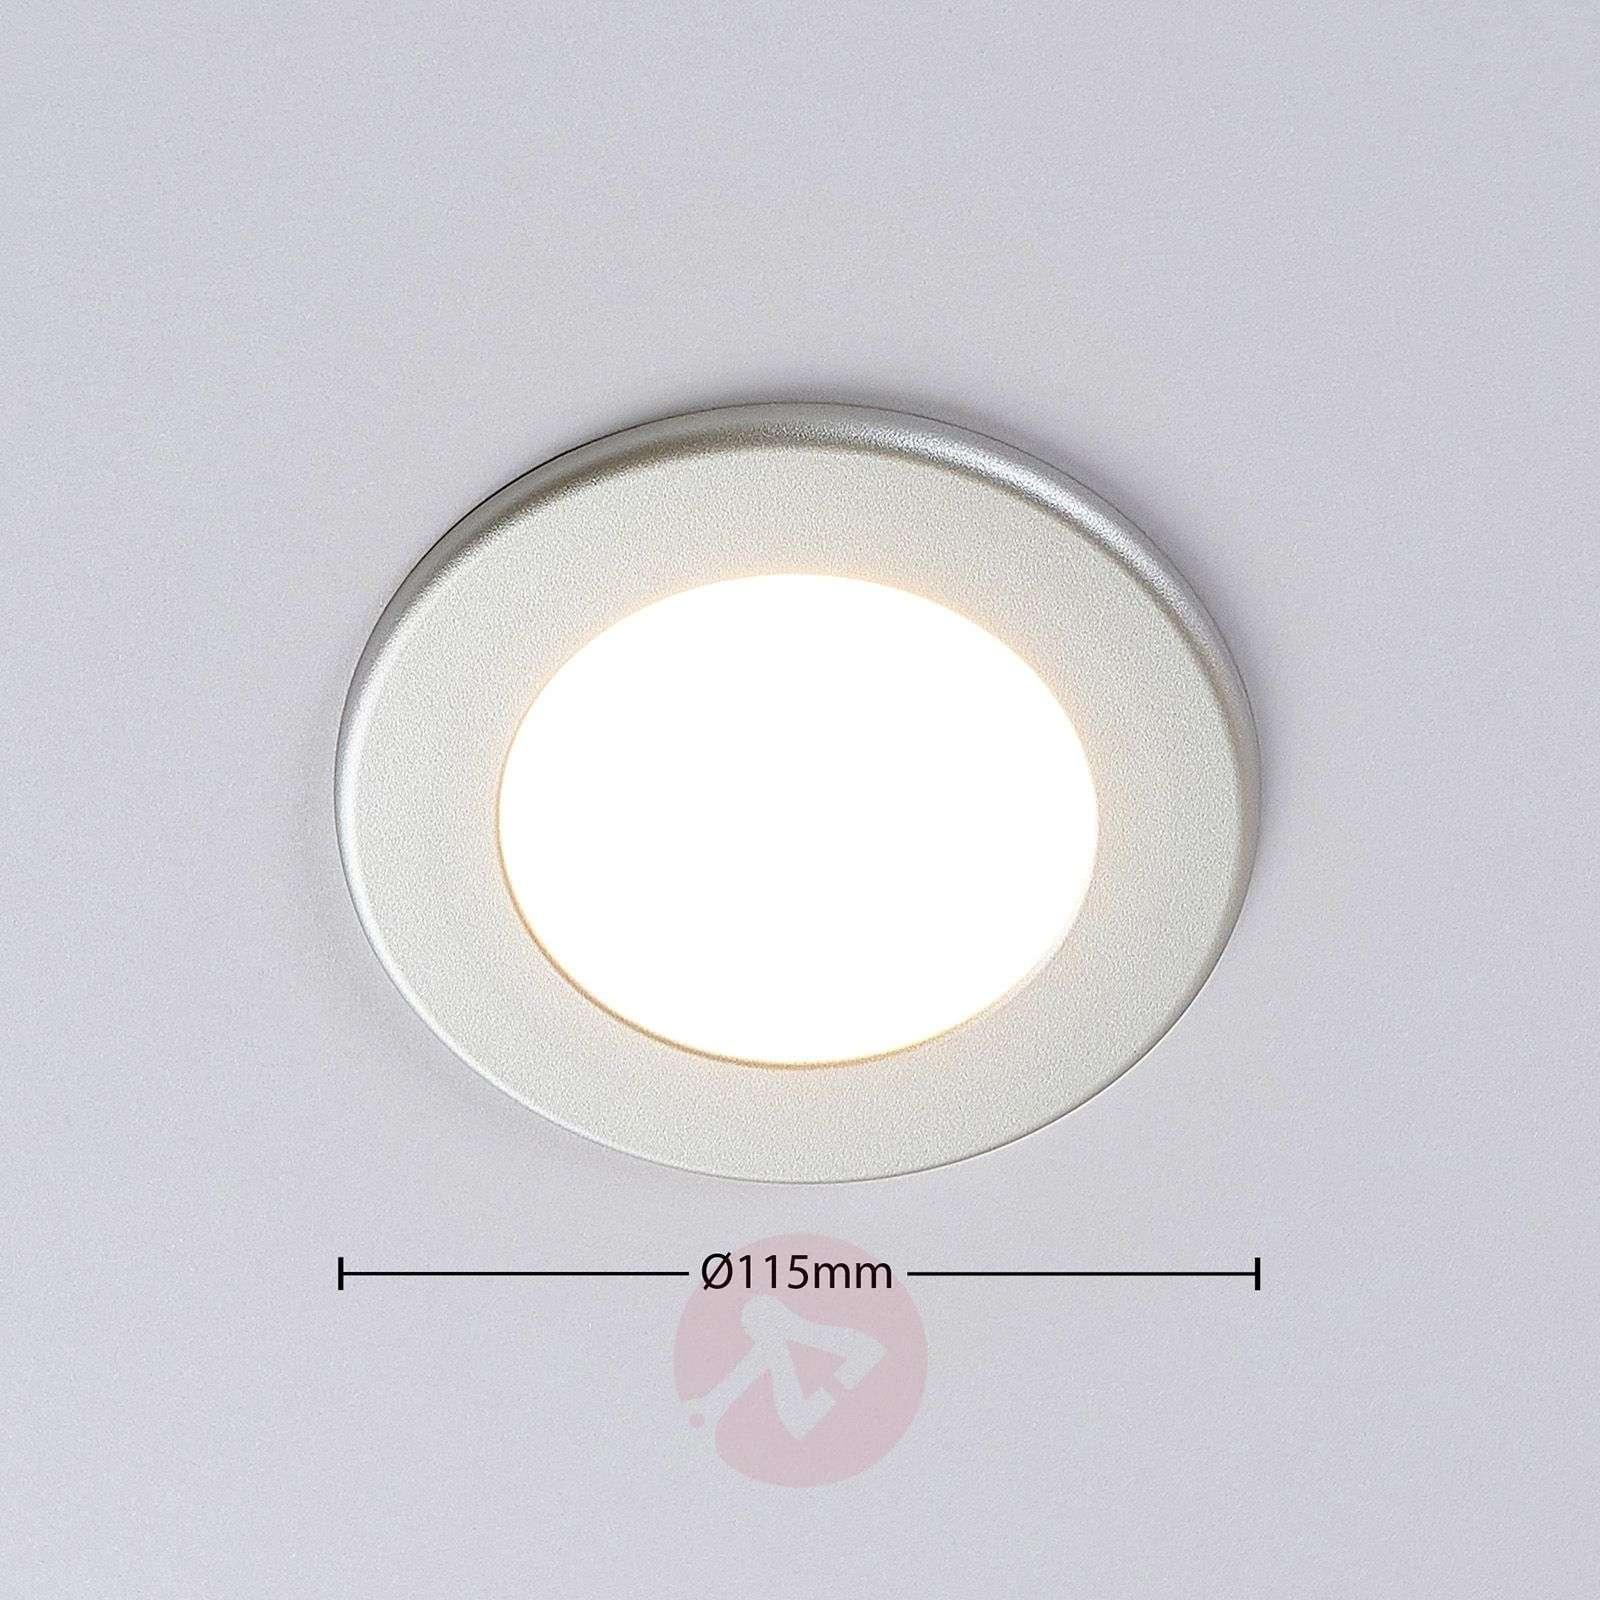 Joki LED downlight silver 3,000K round 11.5cm-9978045-02